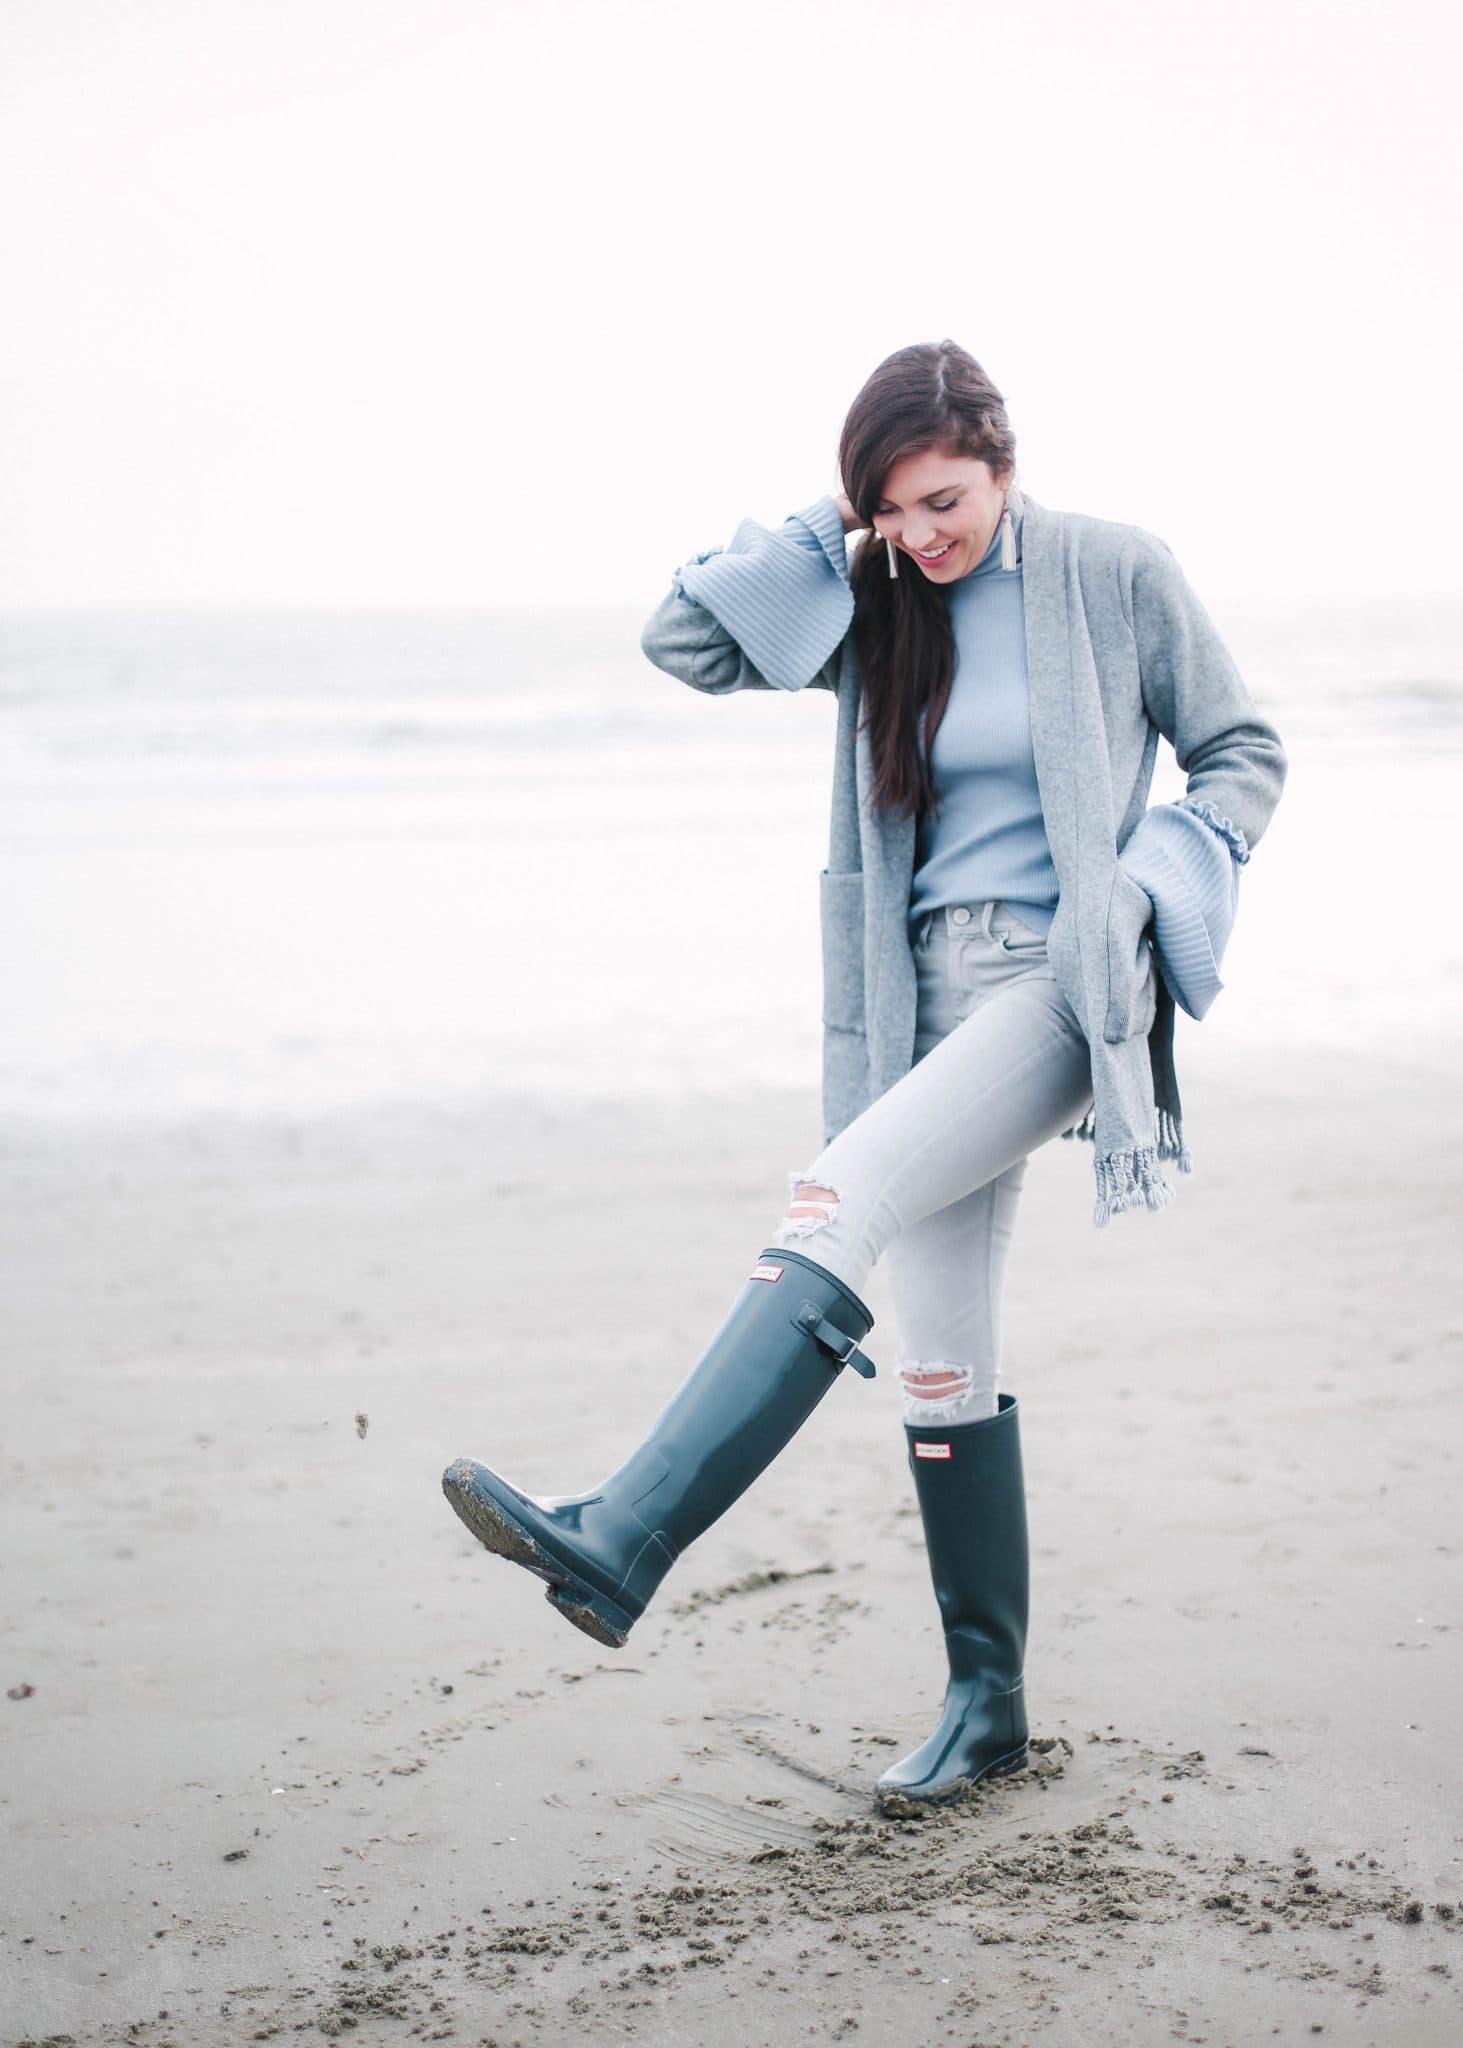 hunter boots teal beach, winter beach photography, pretty in the pines, sullivan's island, charleston, travel blog